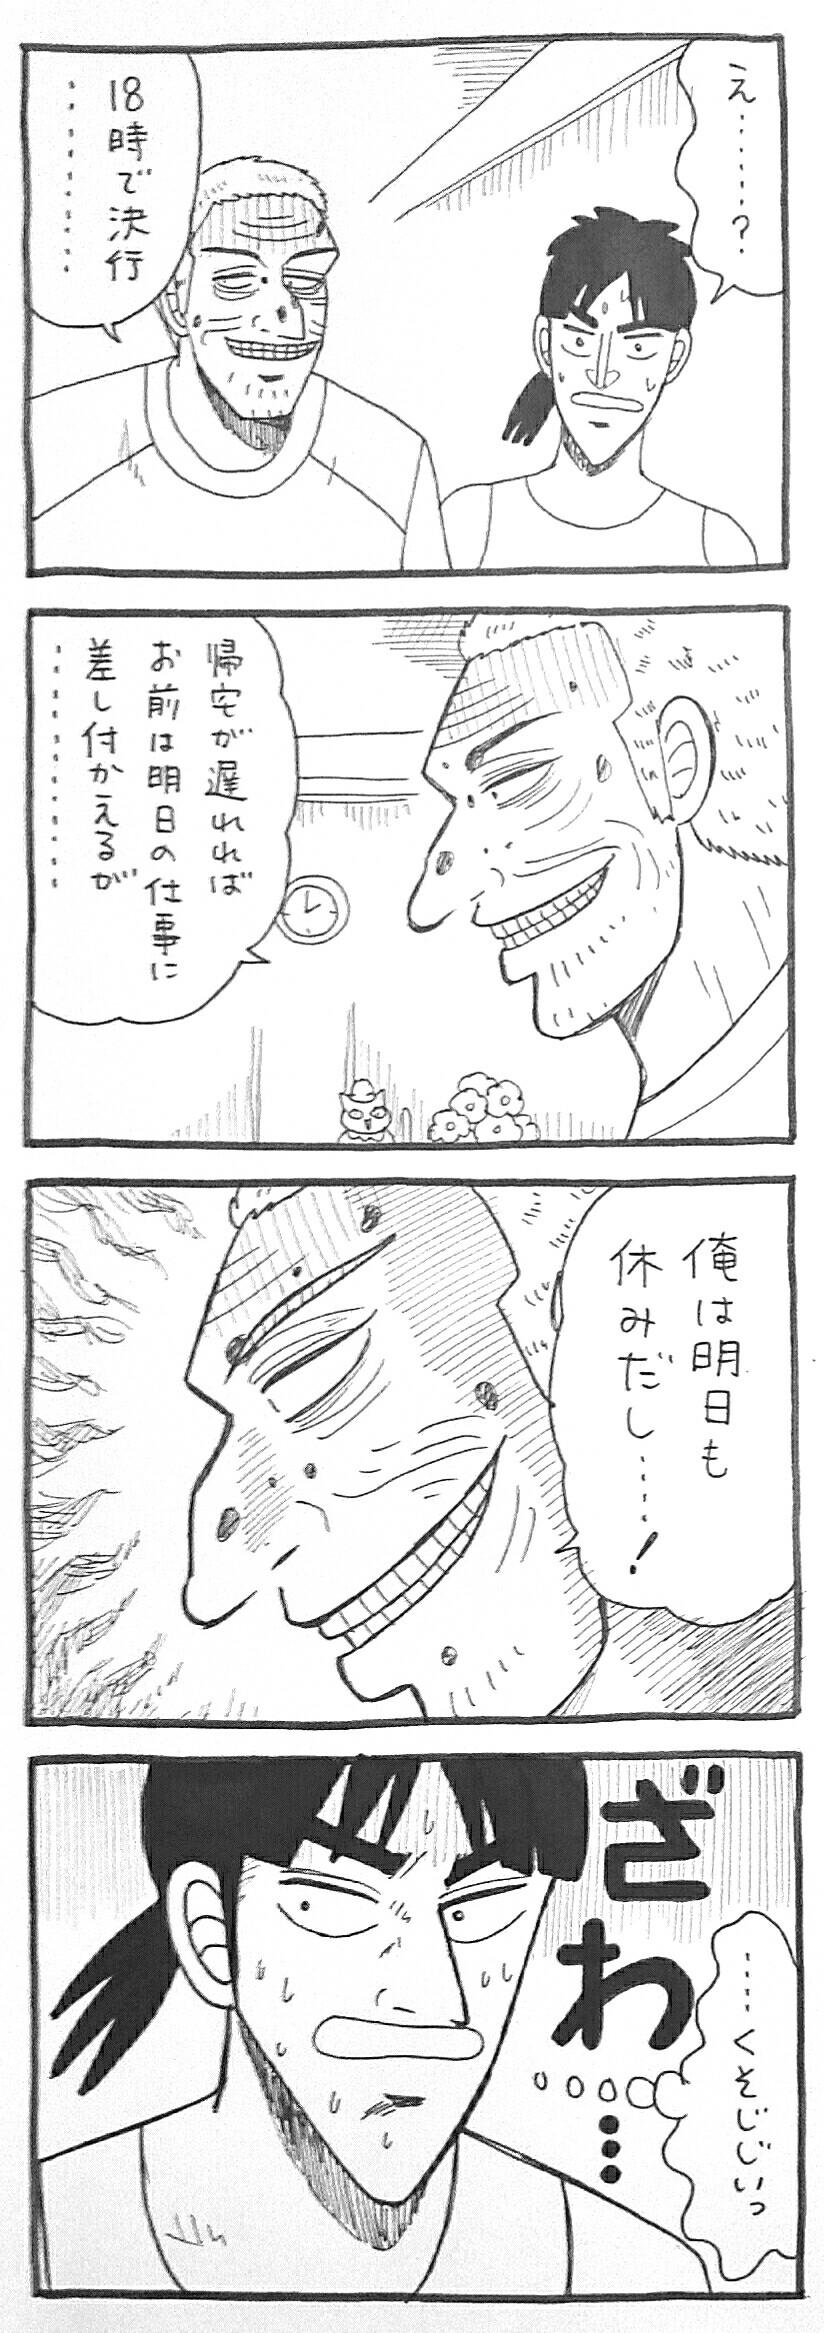 f:id:Shoko_drawing:20190815222120j:plain